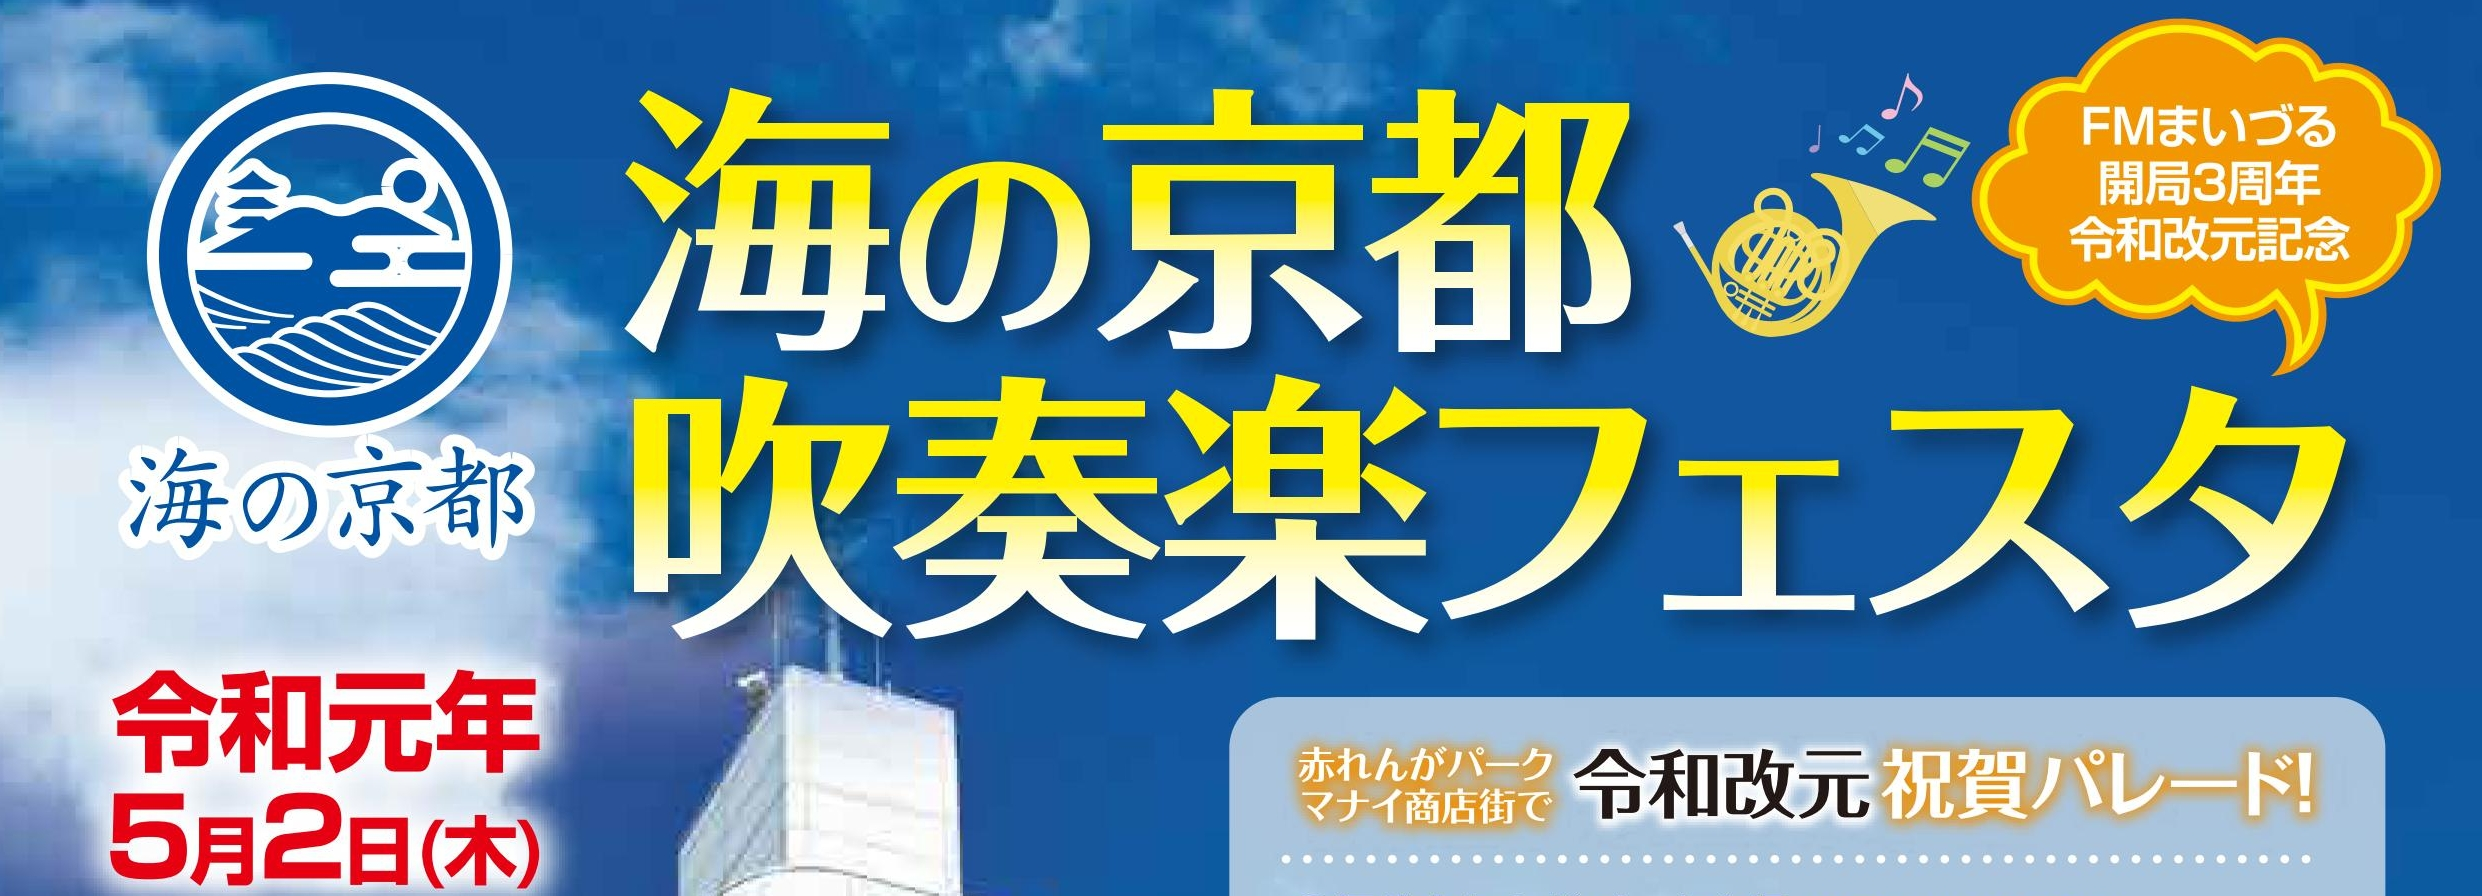 FMまいづる開局3周年・令和改元記念「海の京都 吹奏楽フェスタ」